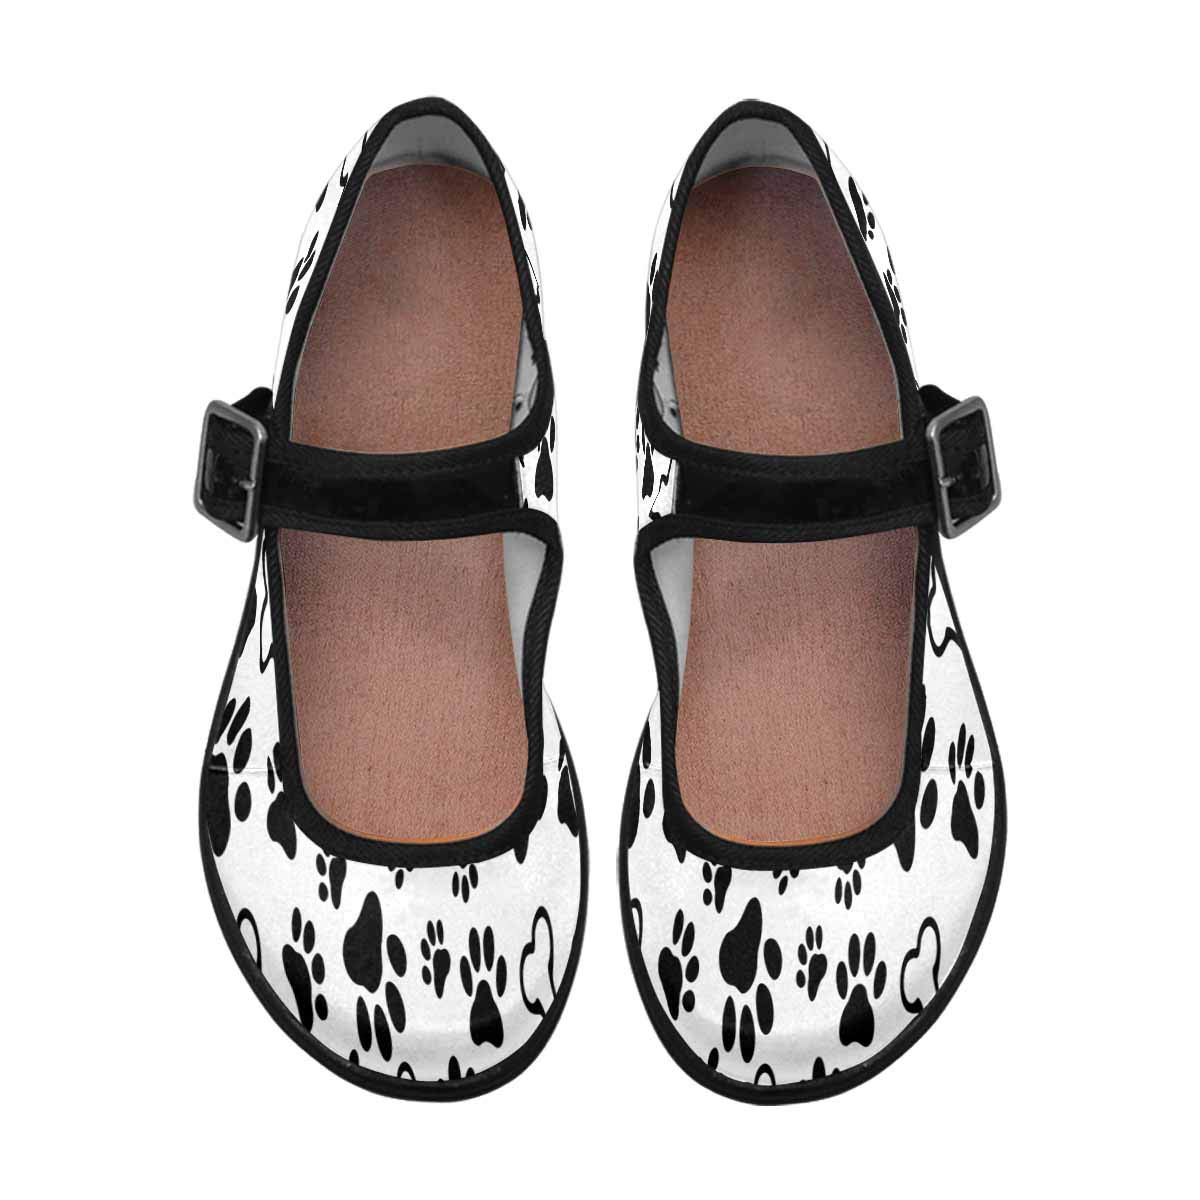 INTERESTPRINT Womens Satin Mary Jane Flats Ballet Shoes Funny Dog Bone and Paw Prints Footprint